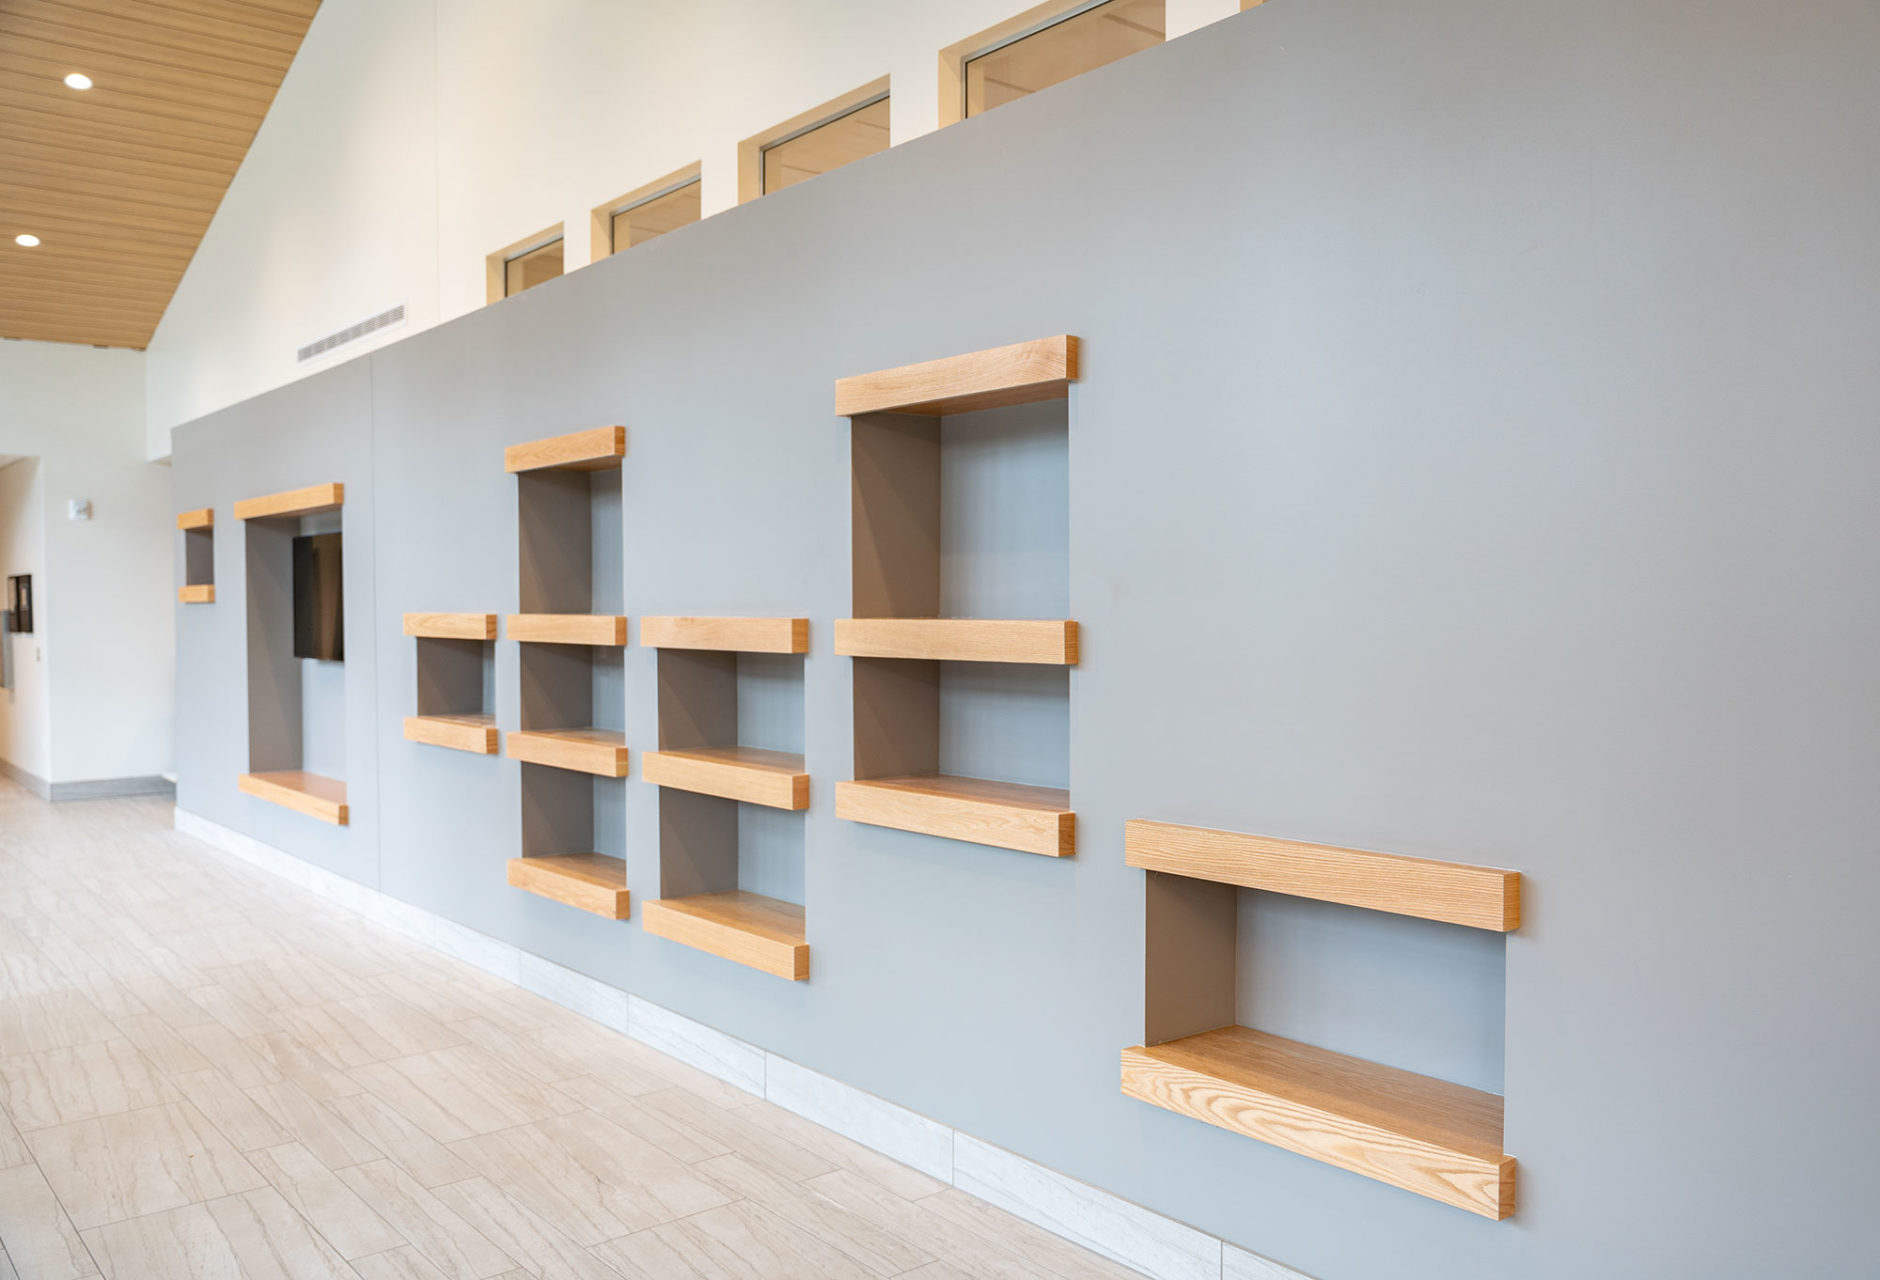 Saugatuck-Douglas Library